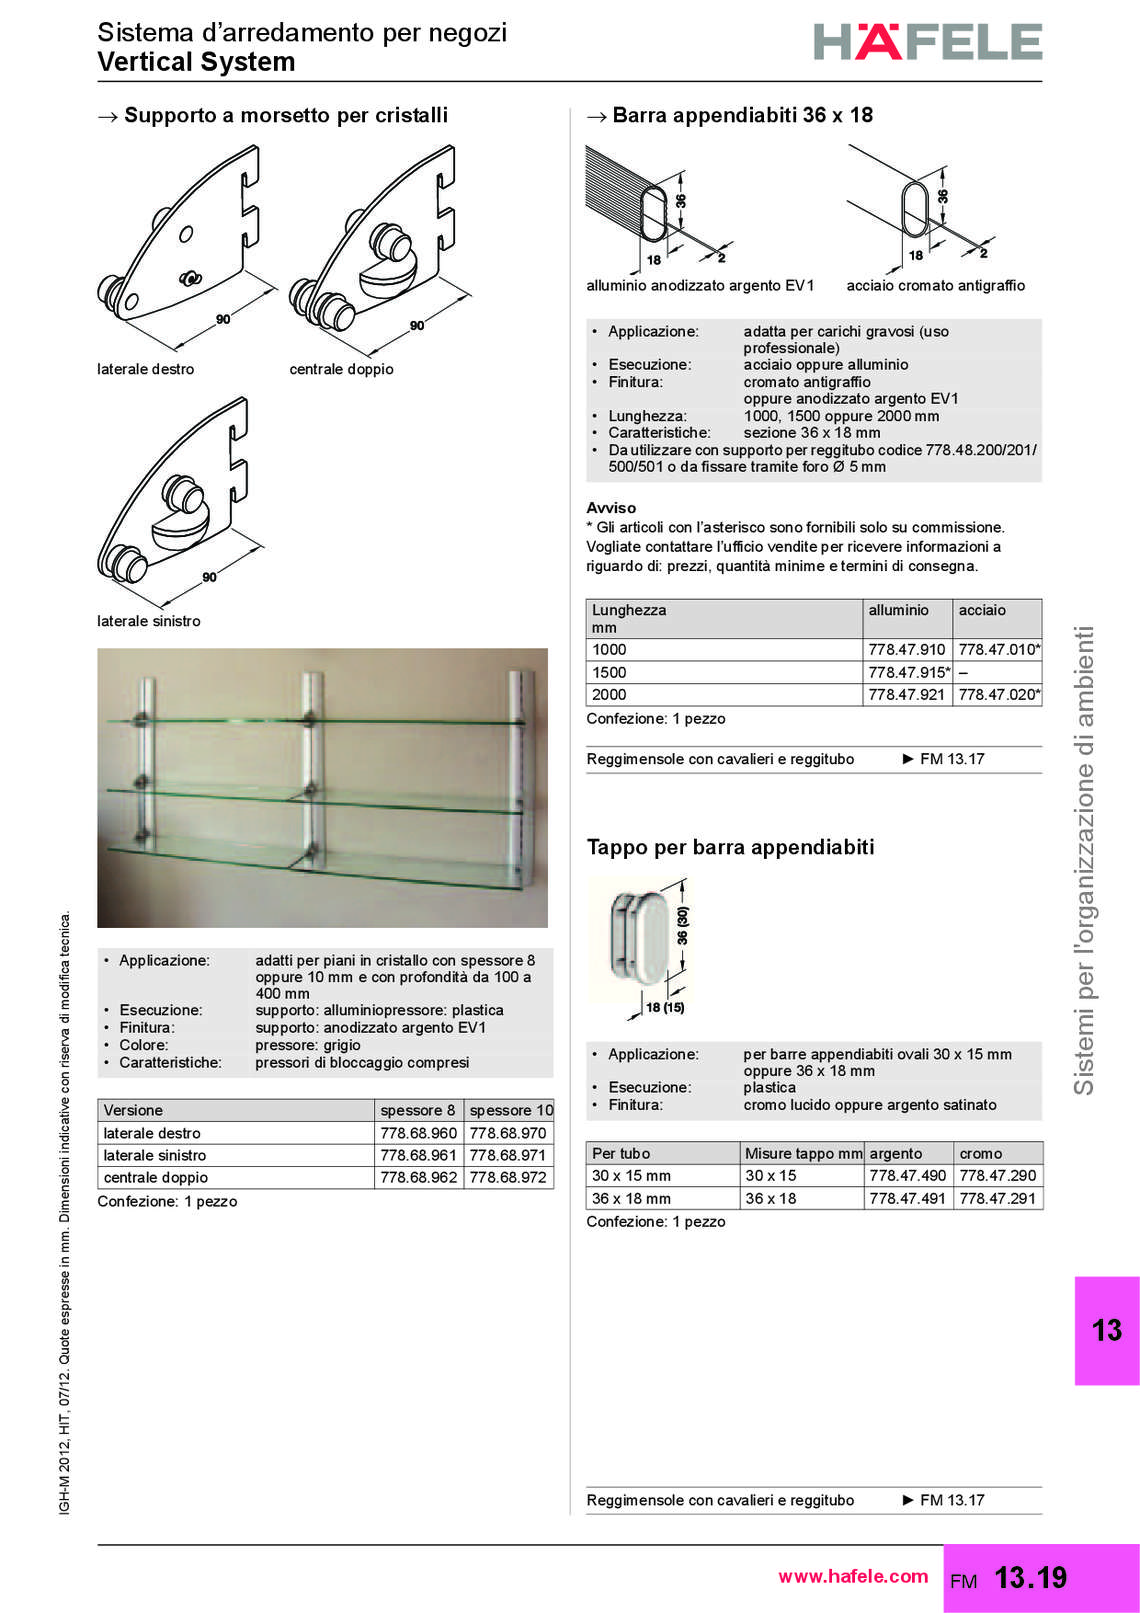 hafele-arredo-negozi-e-farmacie_32_030.jpg